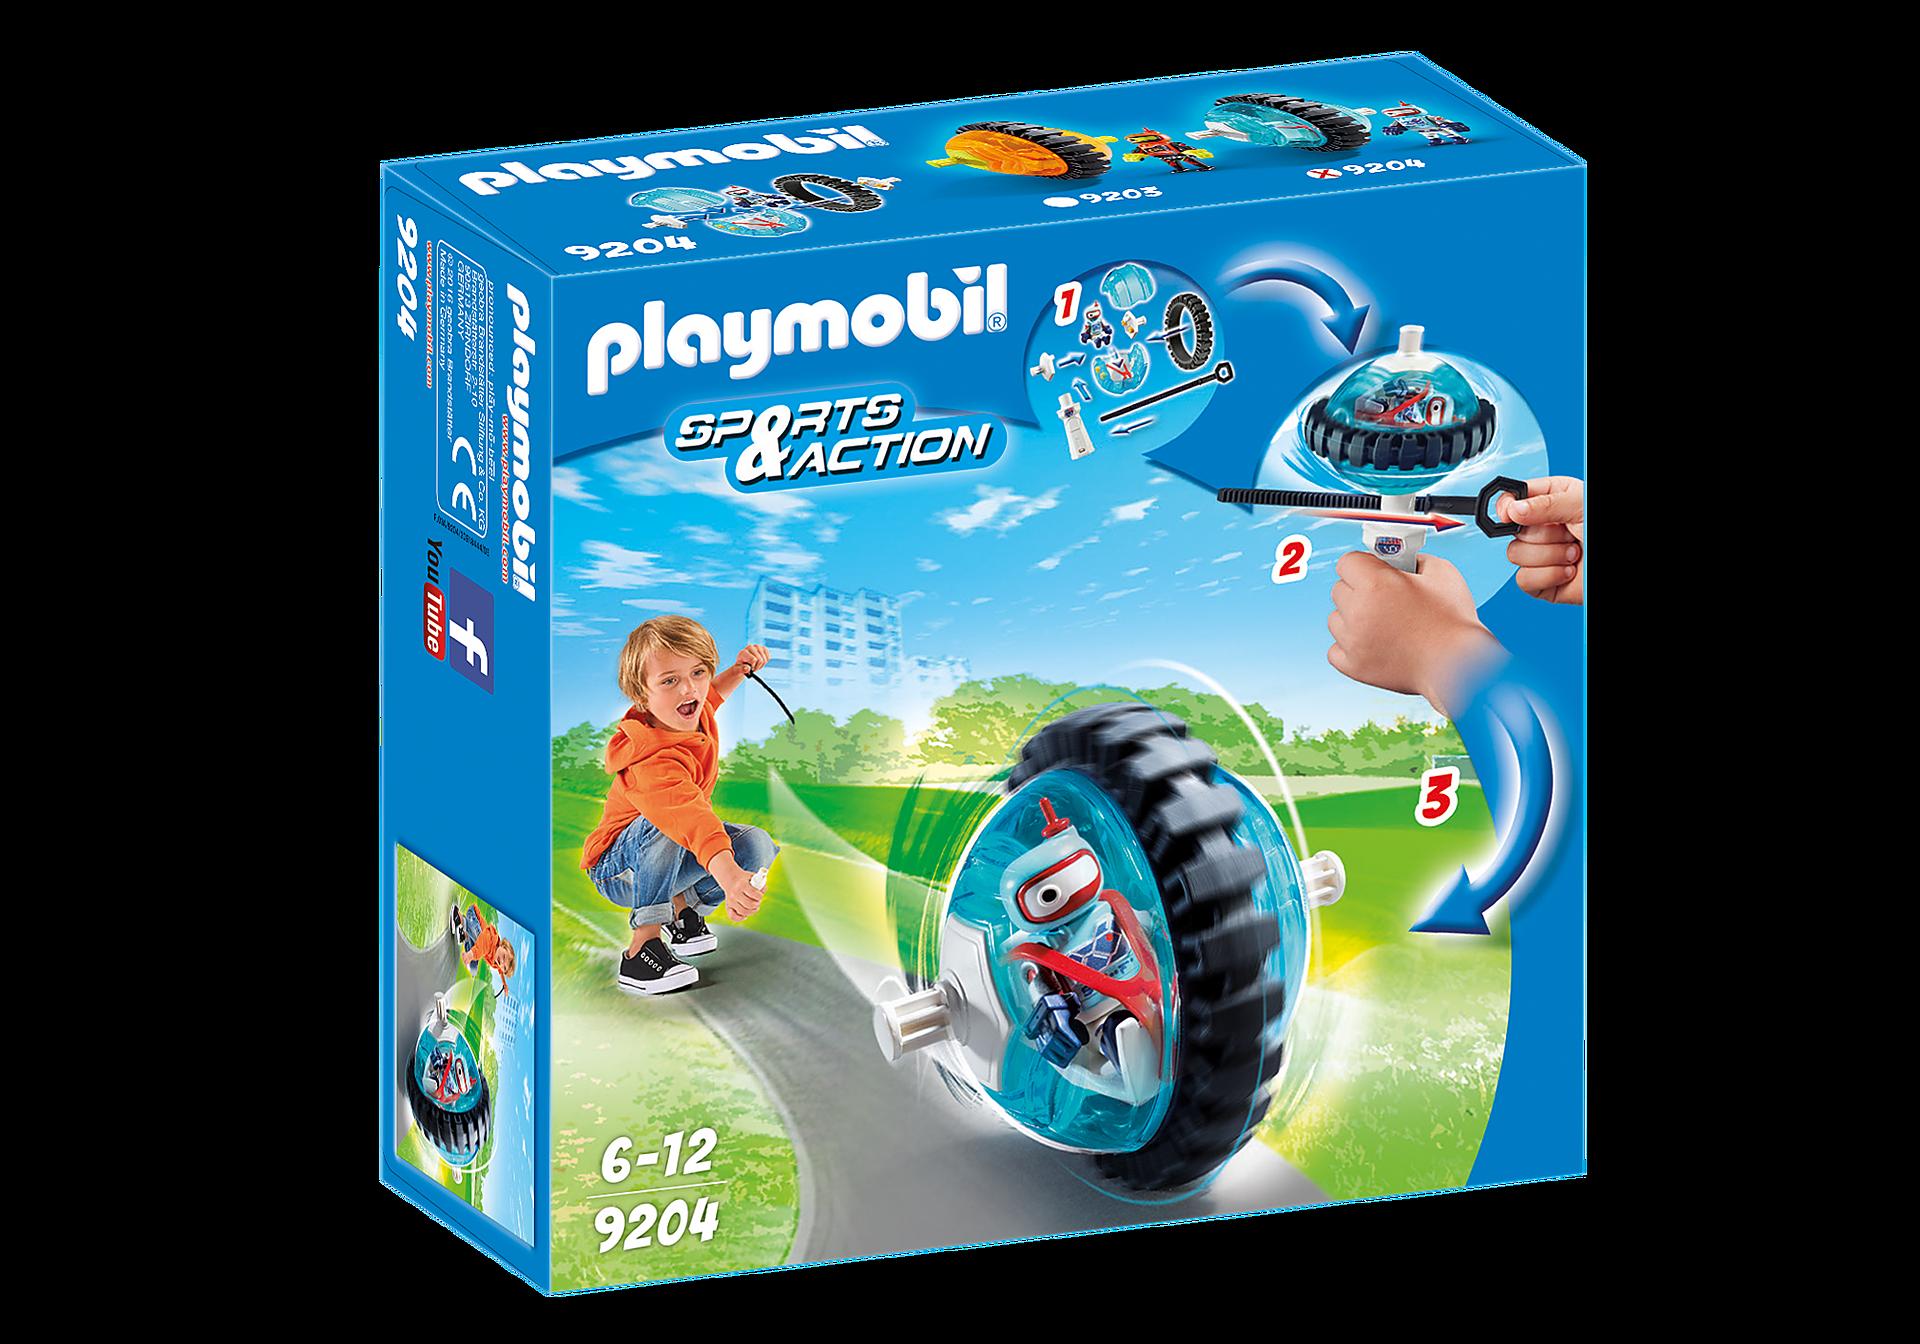 http://media.playmobil.com/i/playmobil/9204_product_box_front/Speed Roller blu con robot